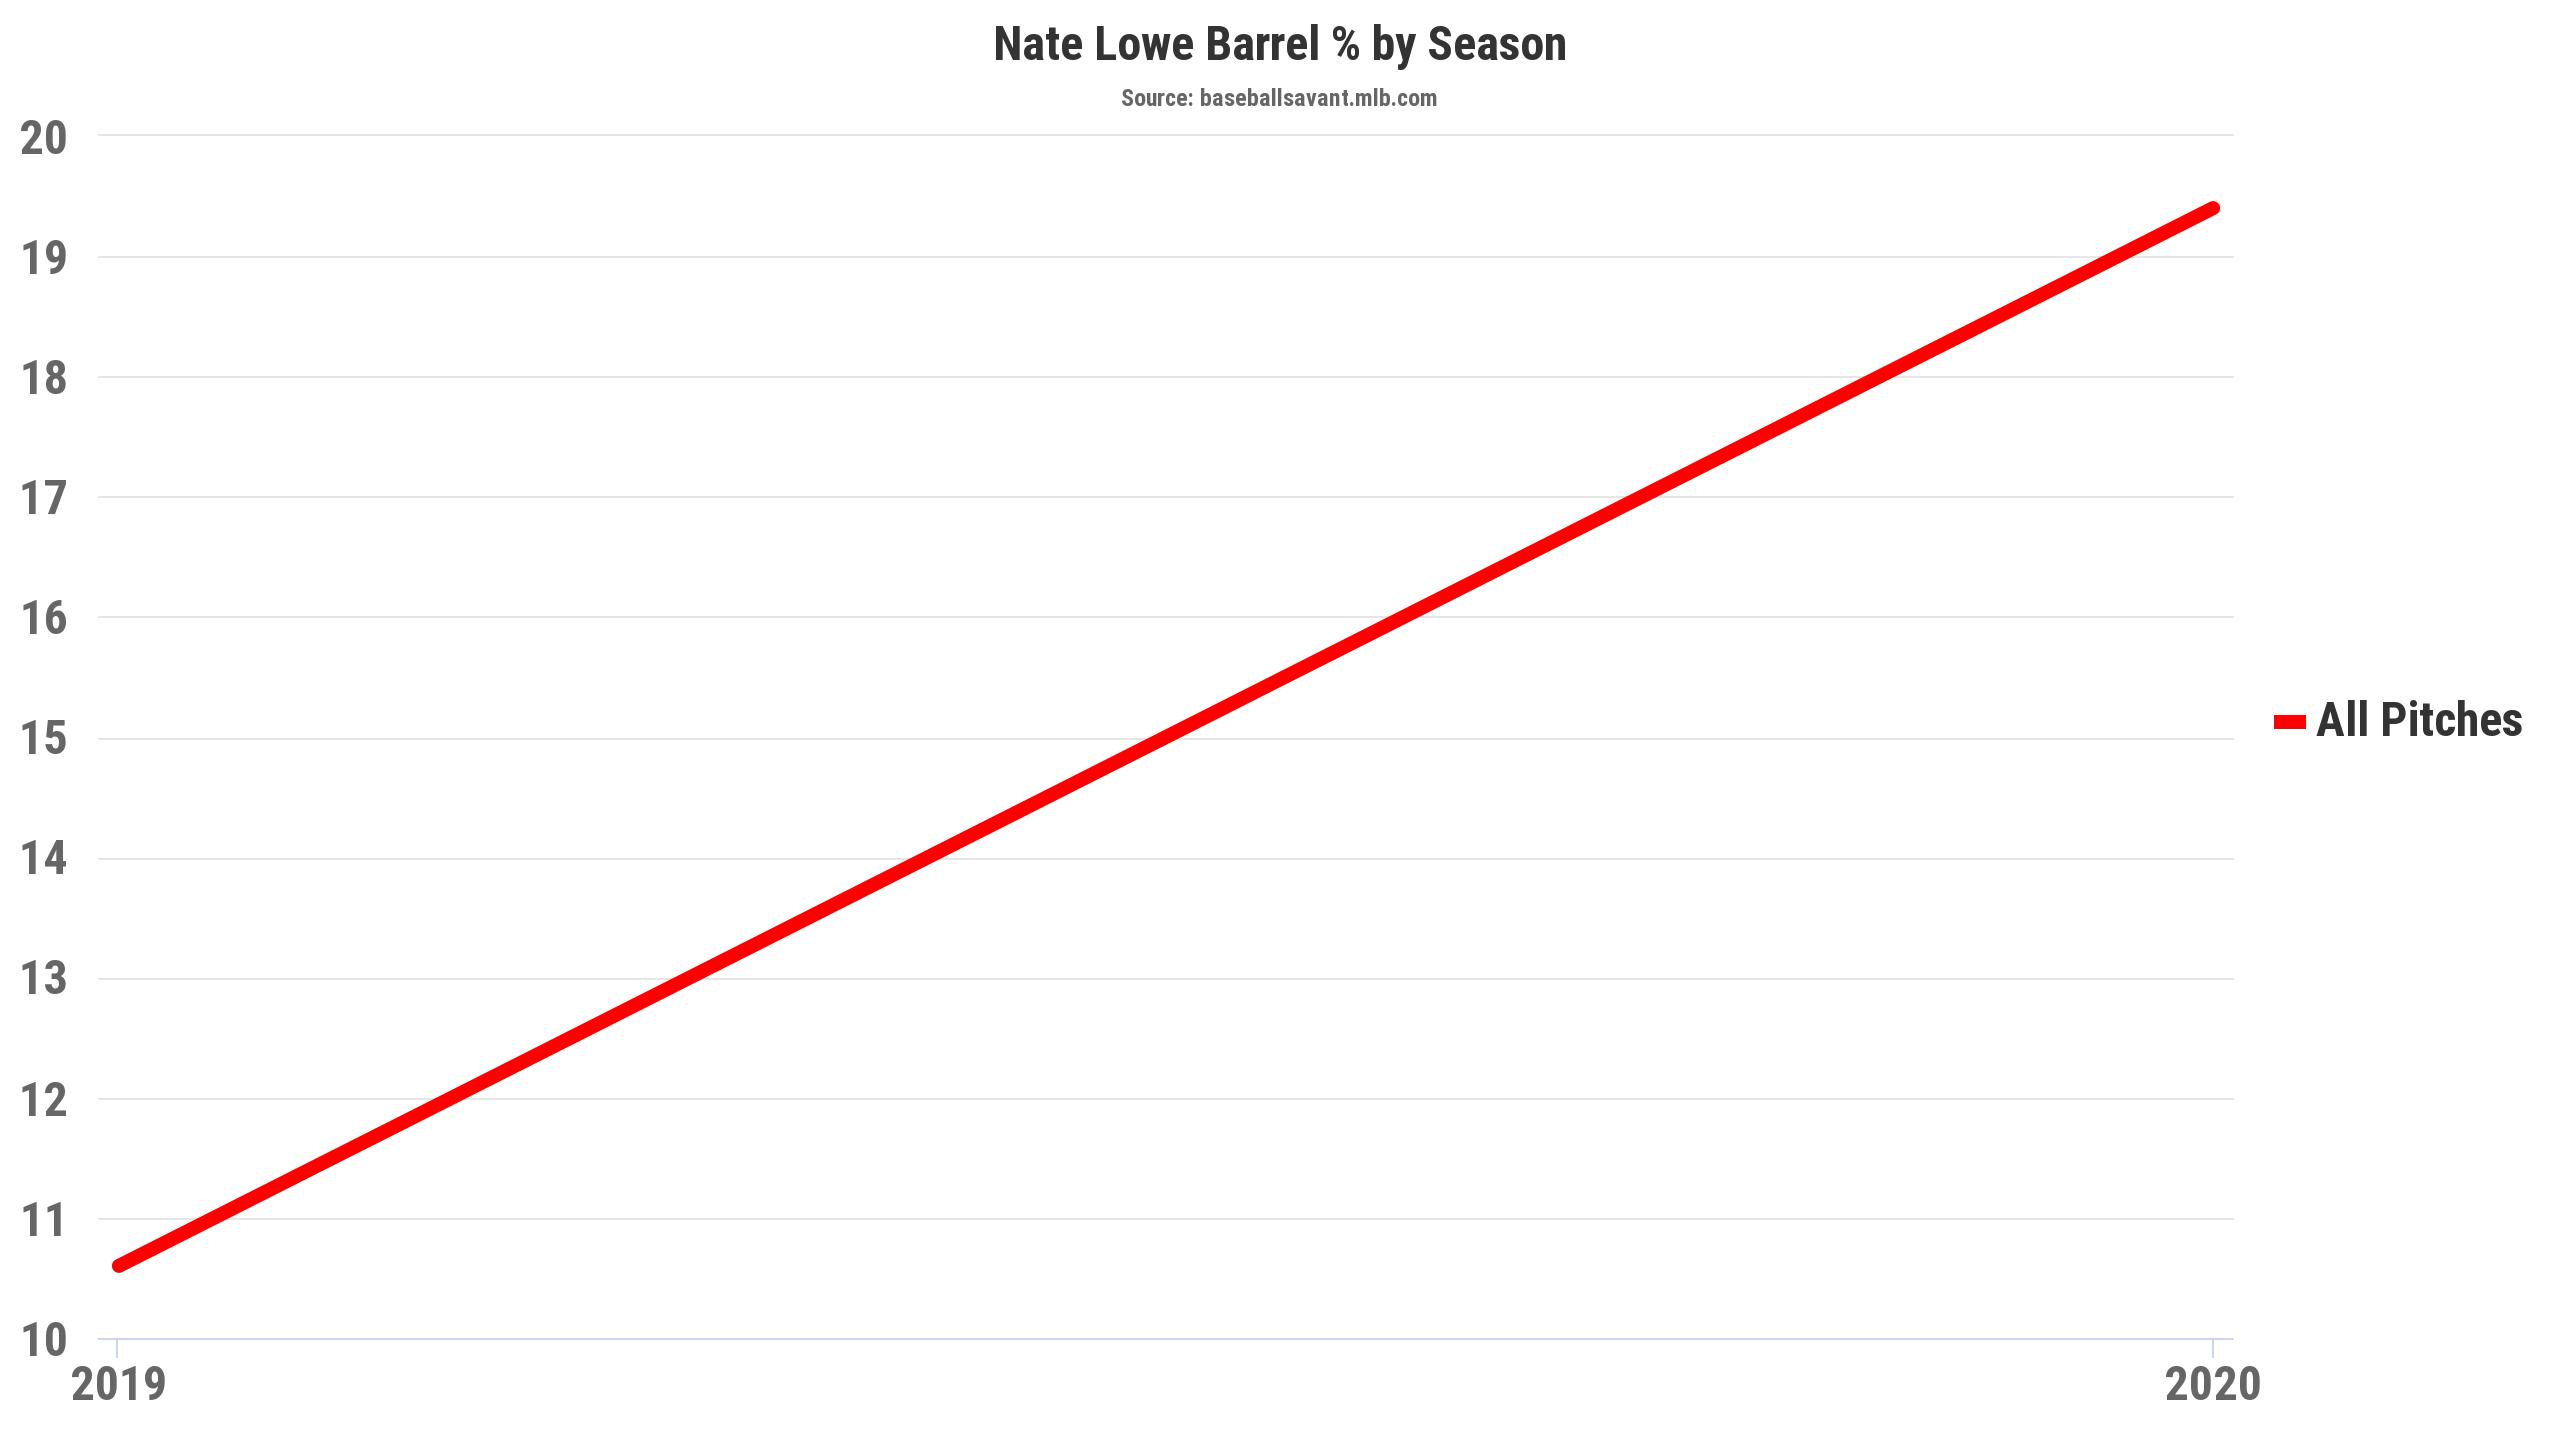 Nate Lowe Barrels